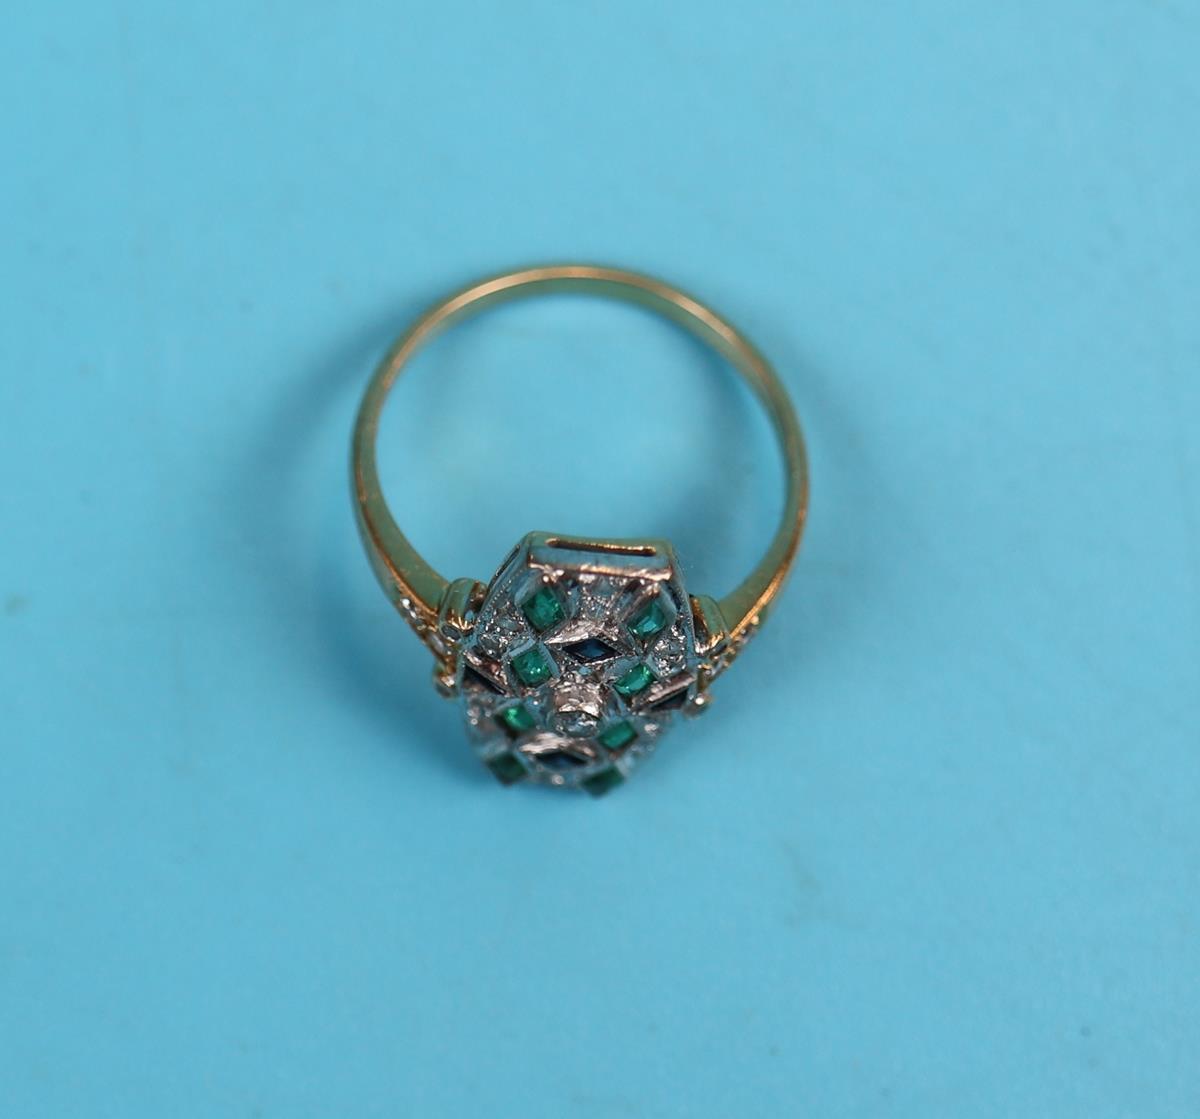 18ct gold Deco style sapphire, emerald & diamond ring - Image 2 of 2